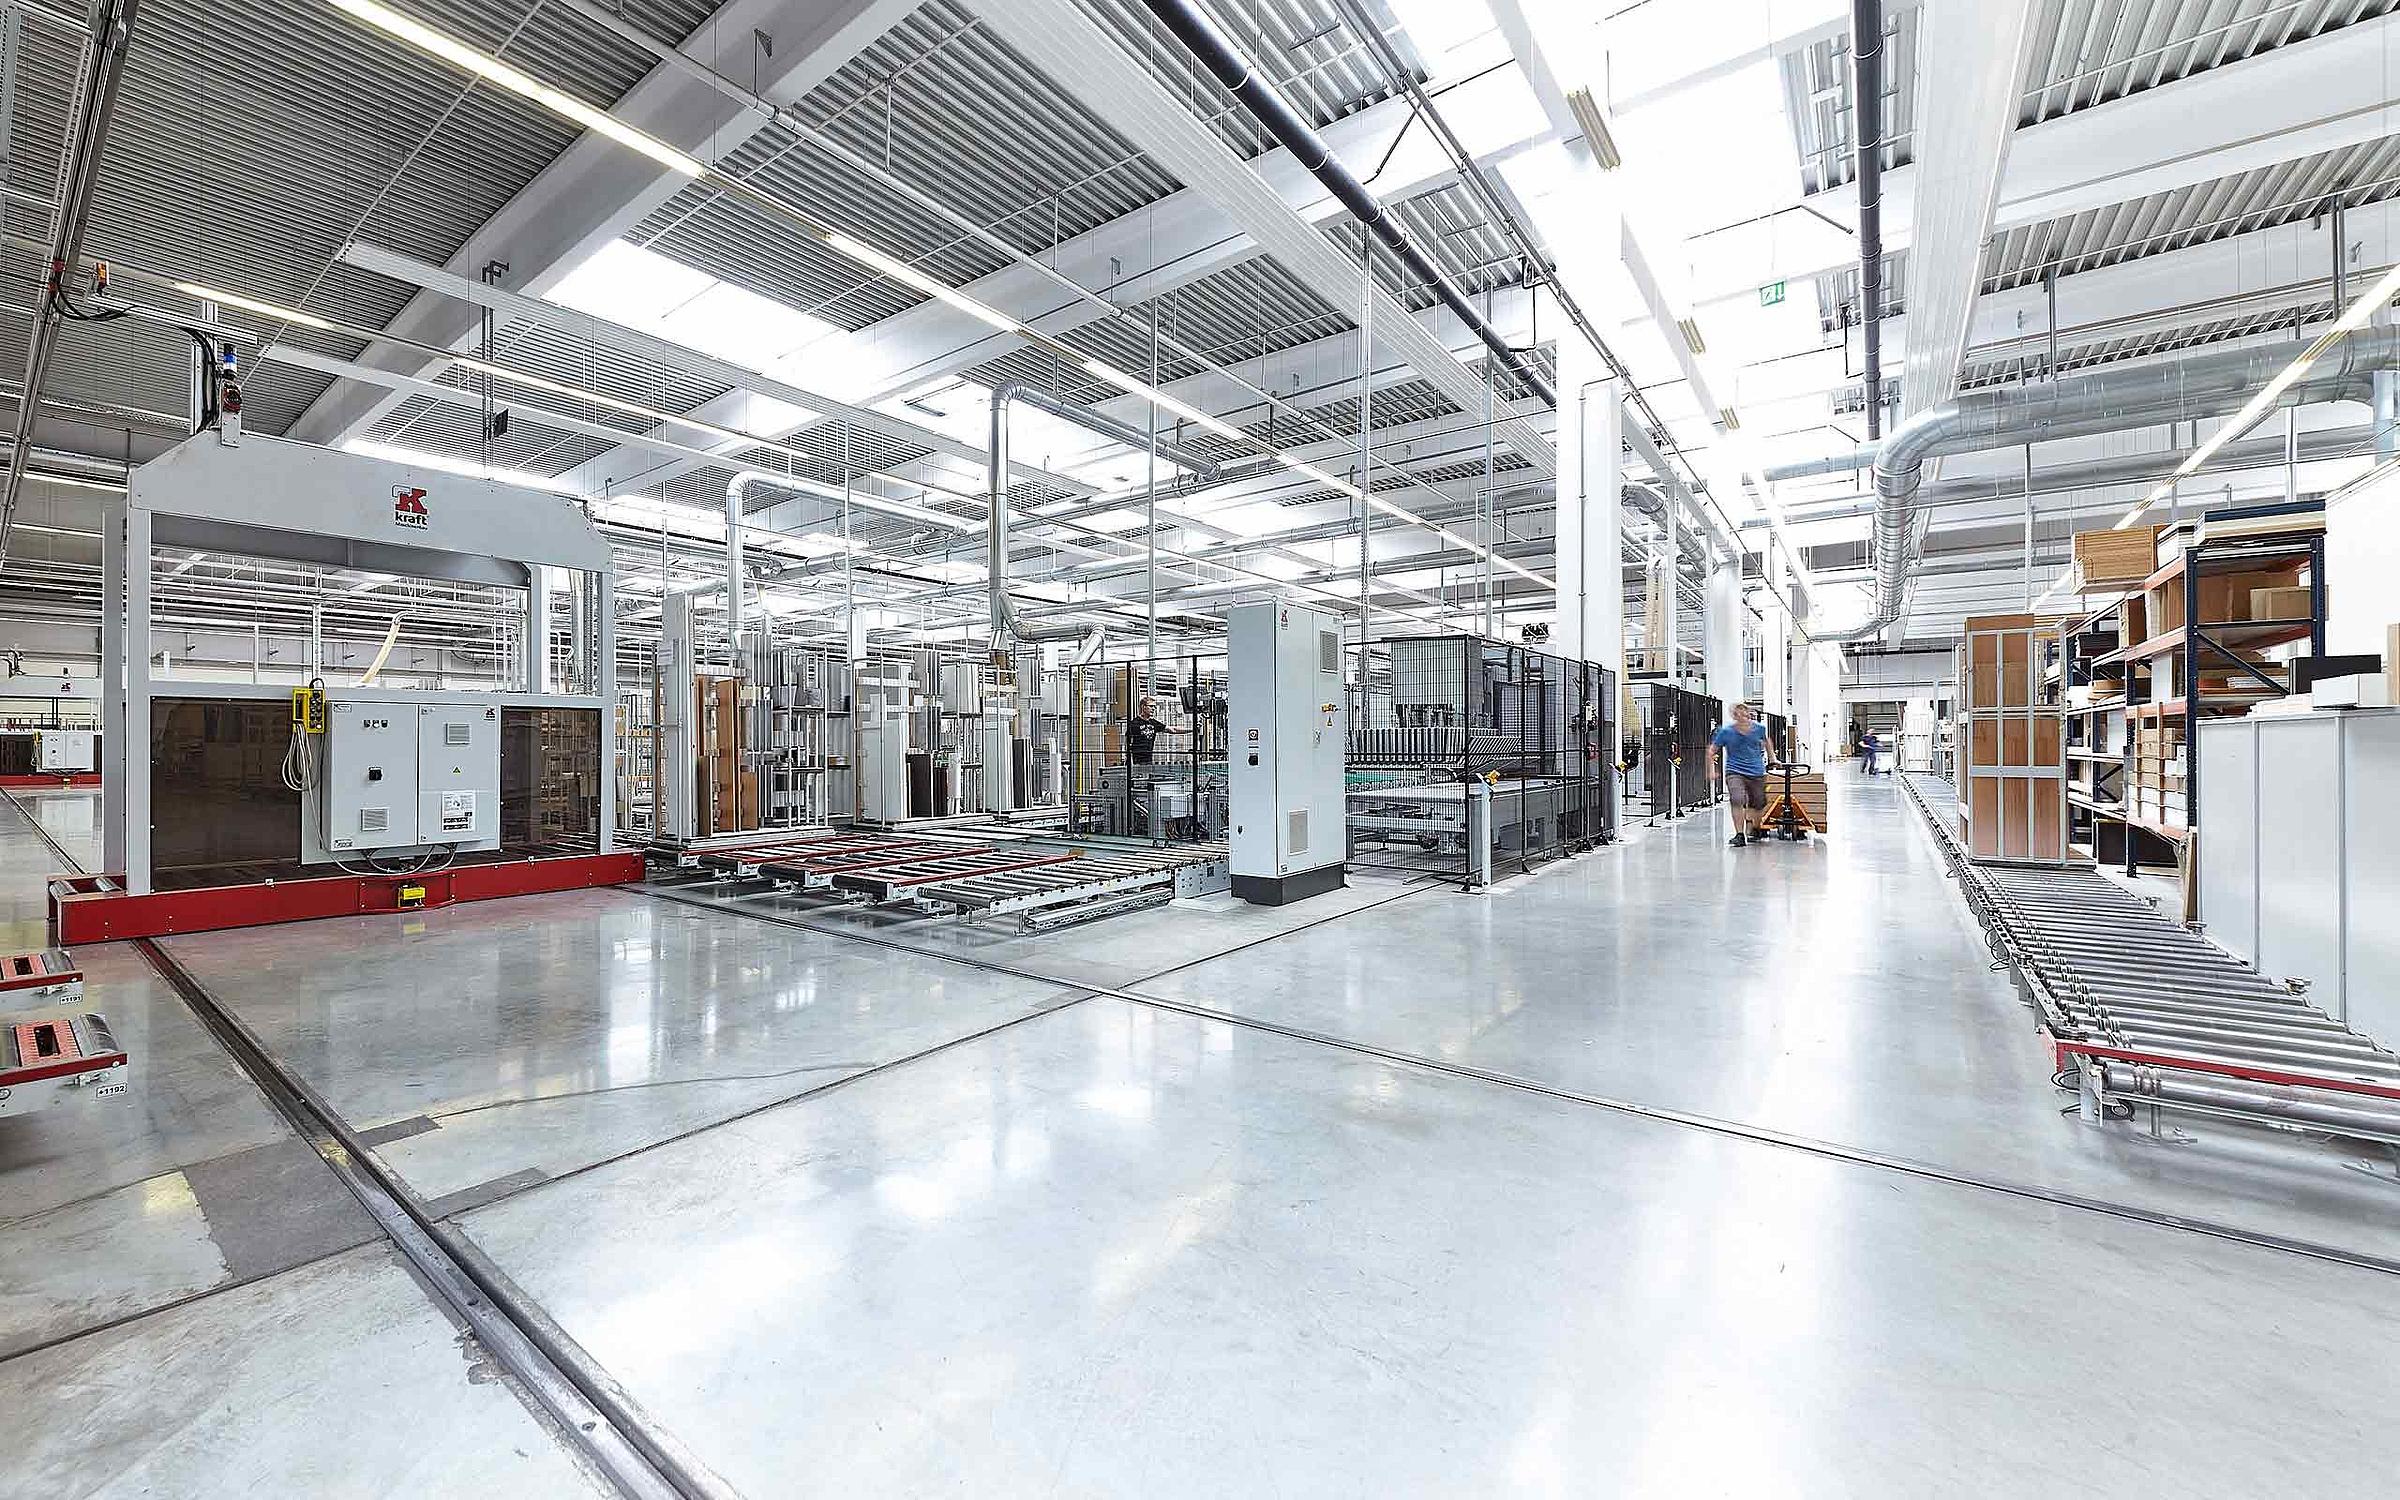 RMW Standort Rietberg Logistik Verladung LKW